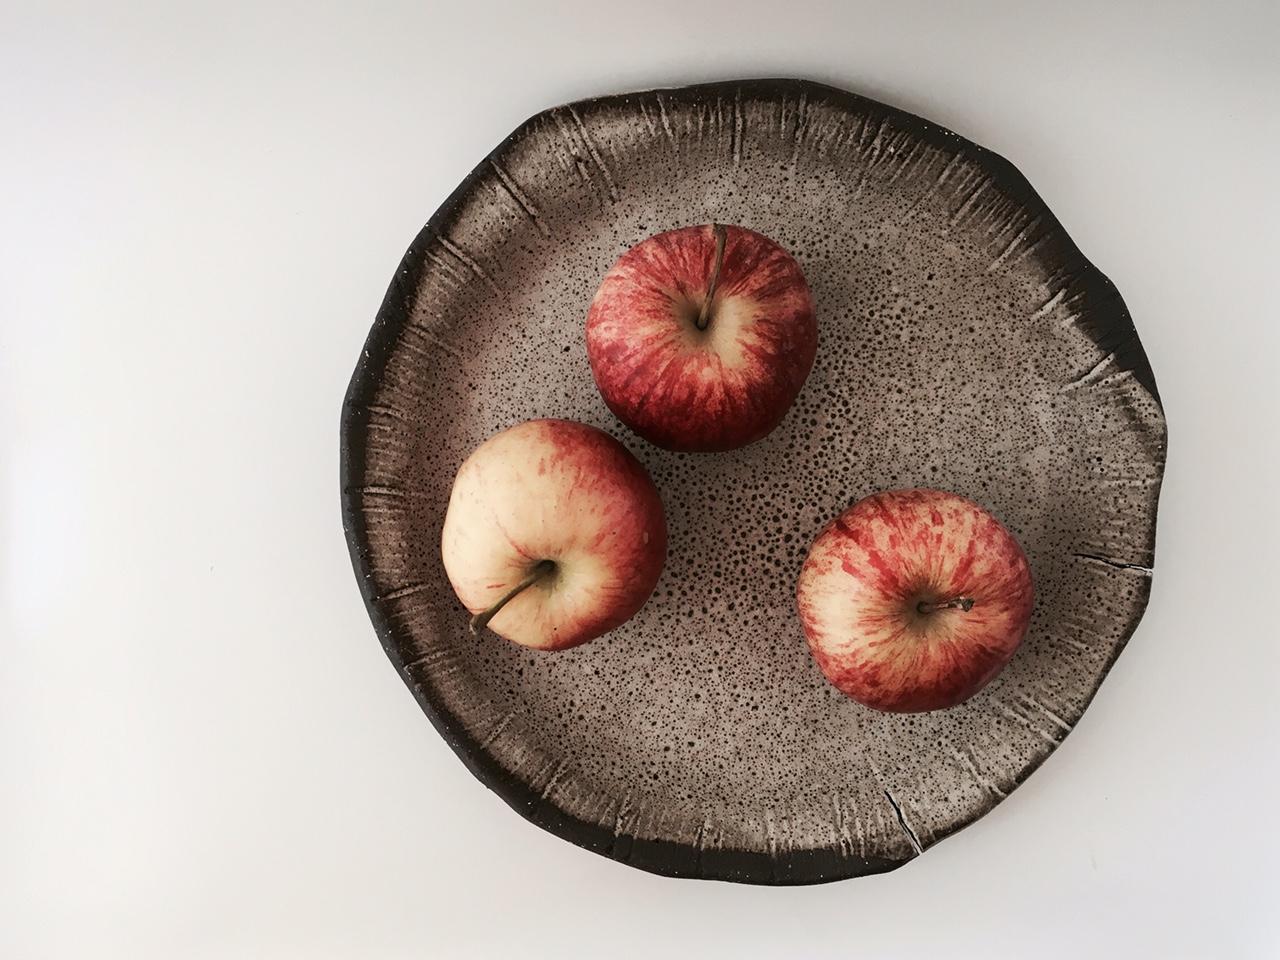 K_rustic fruit bowl_flatC.JPG